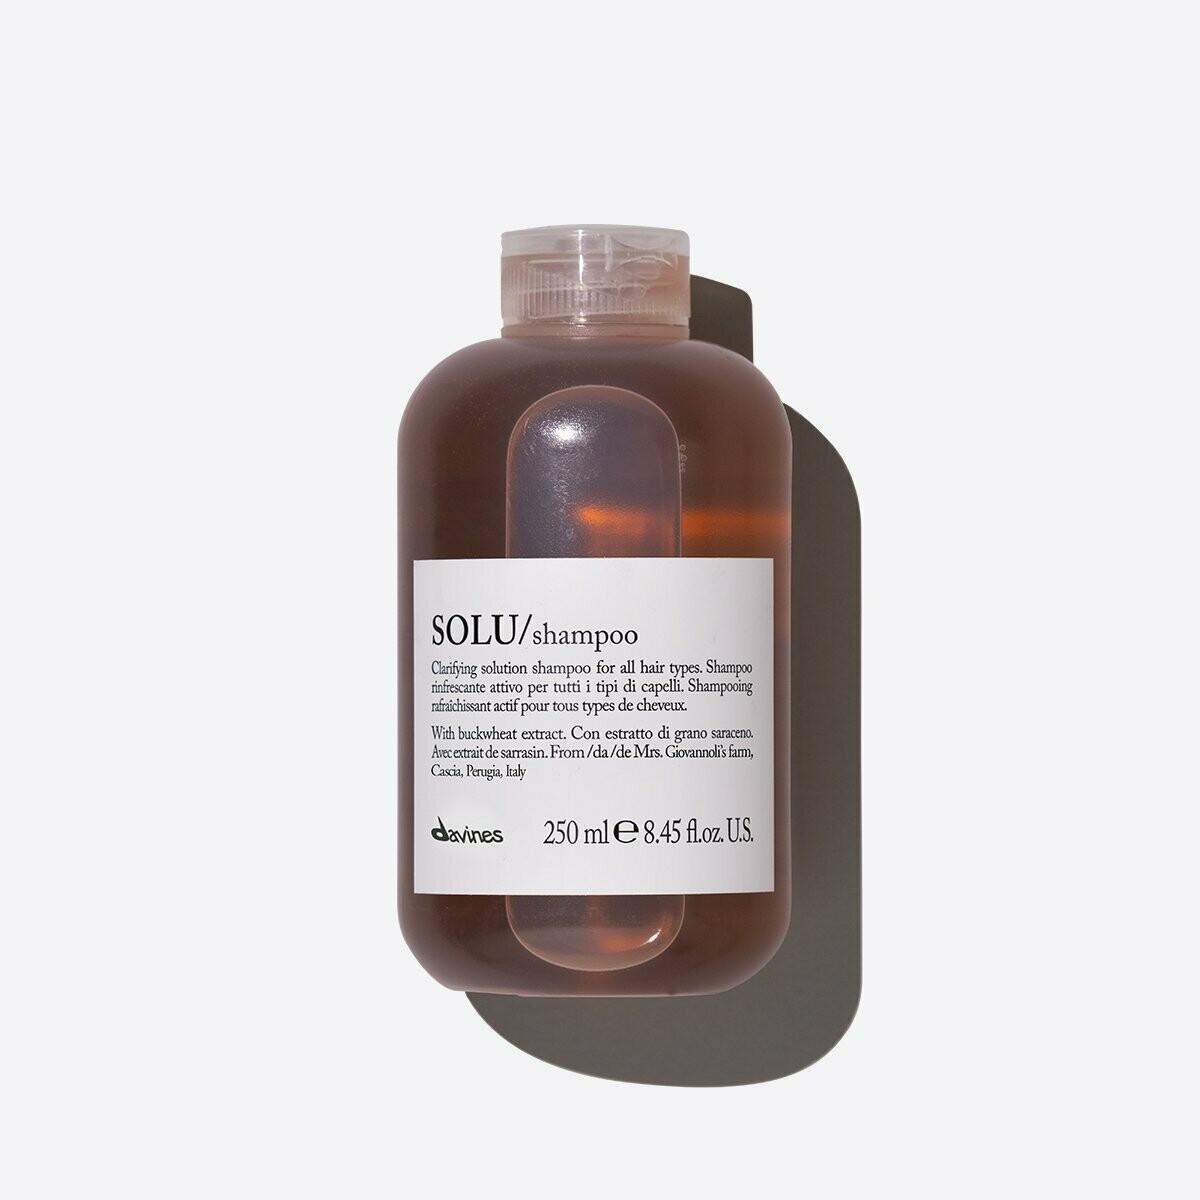 SOLU Shampoo 250ml